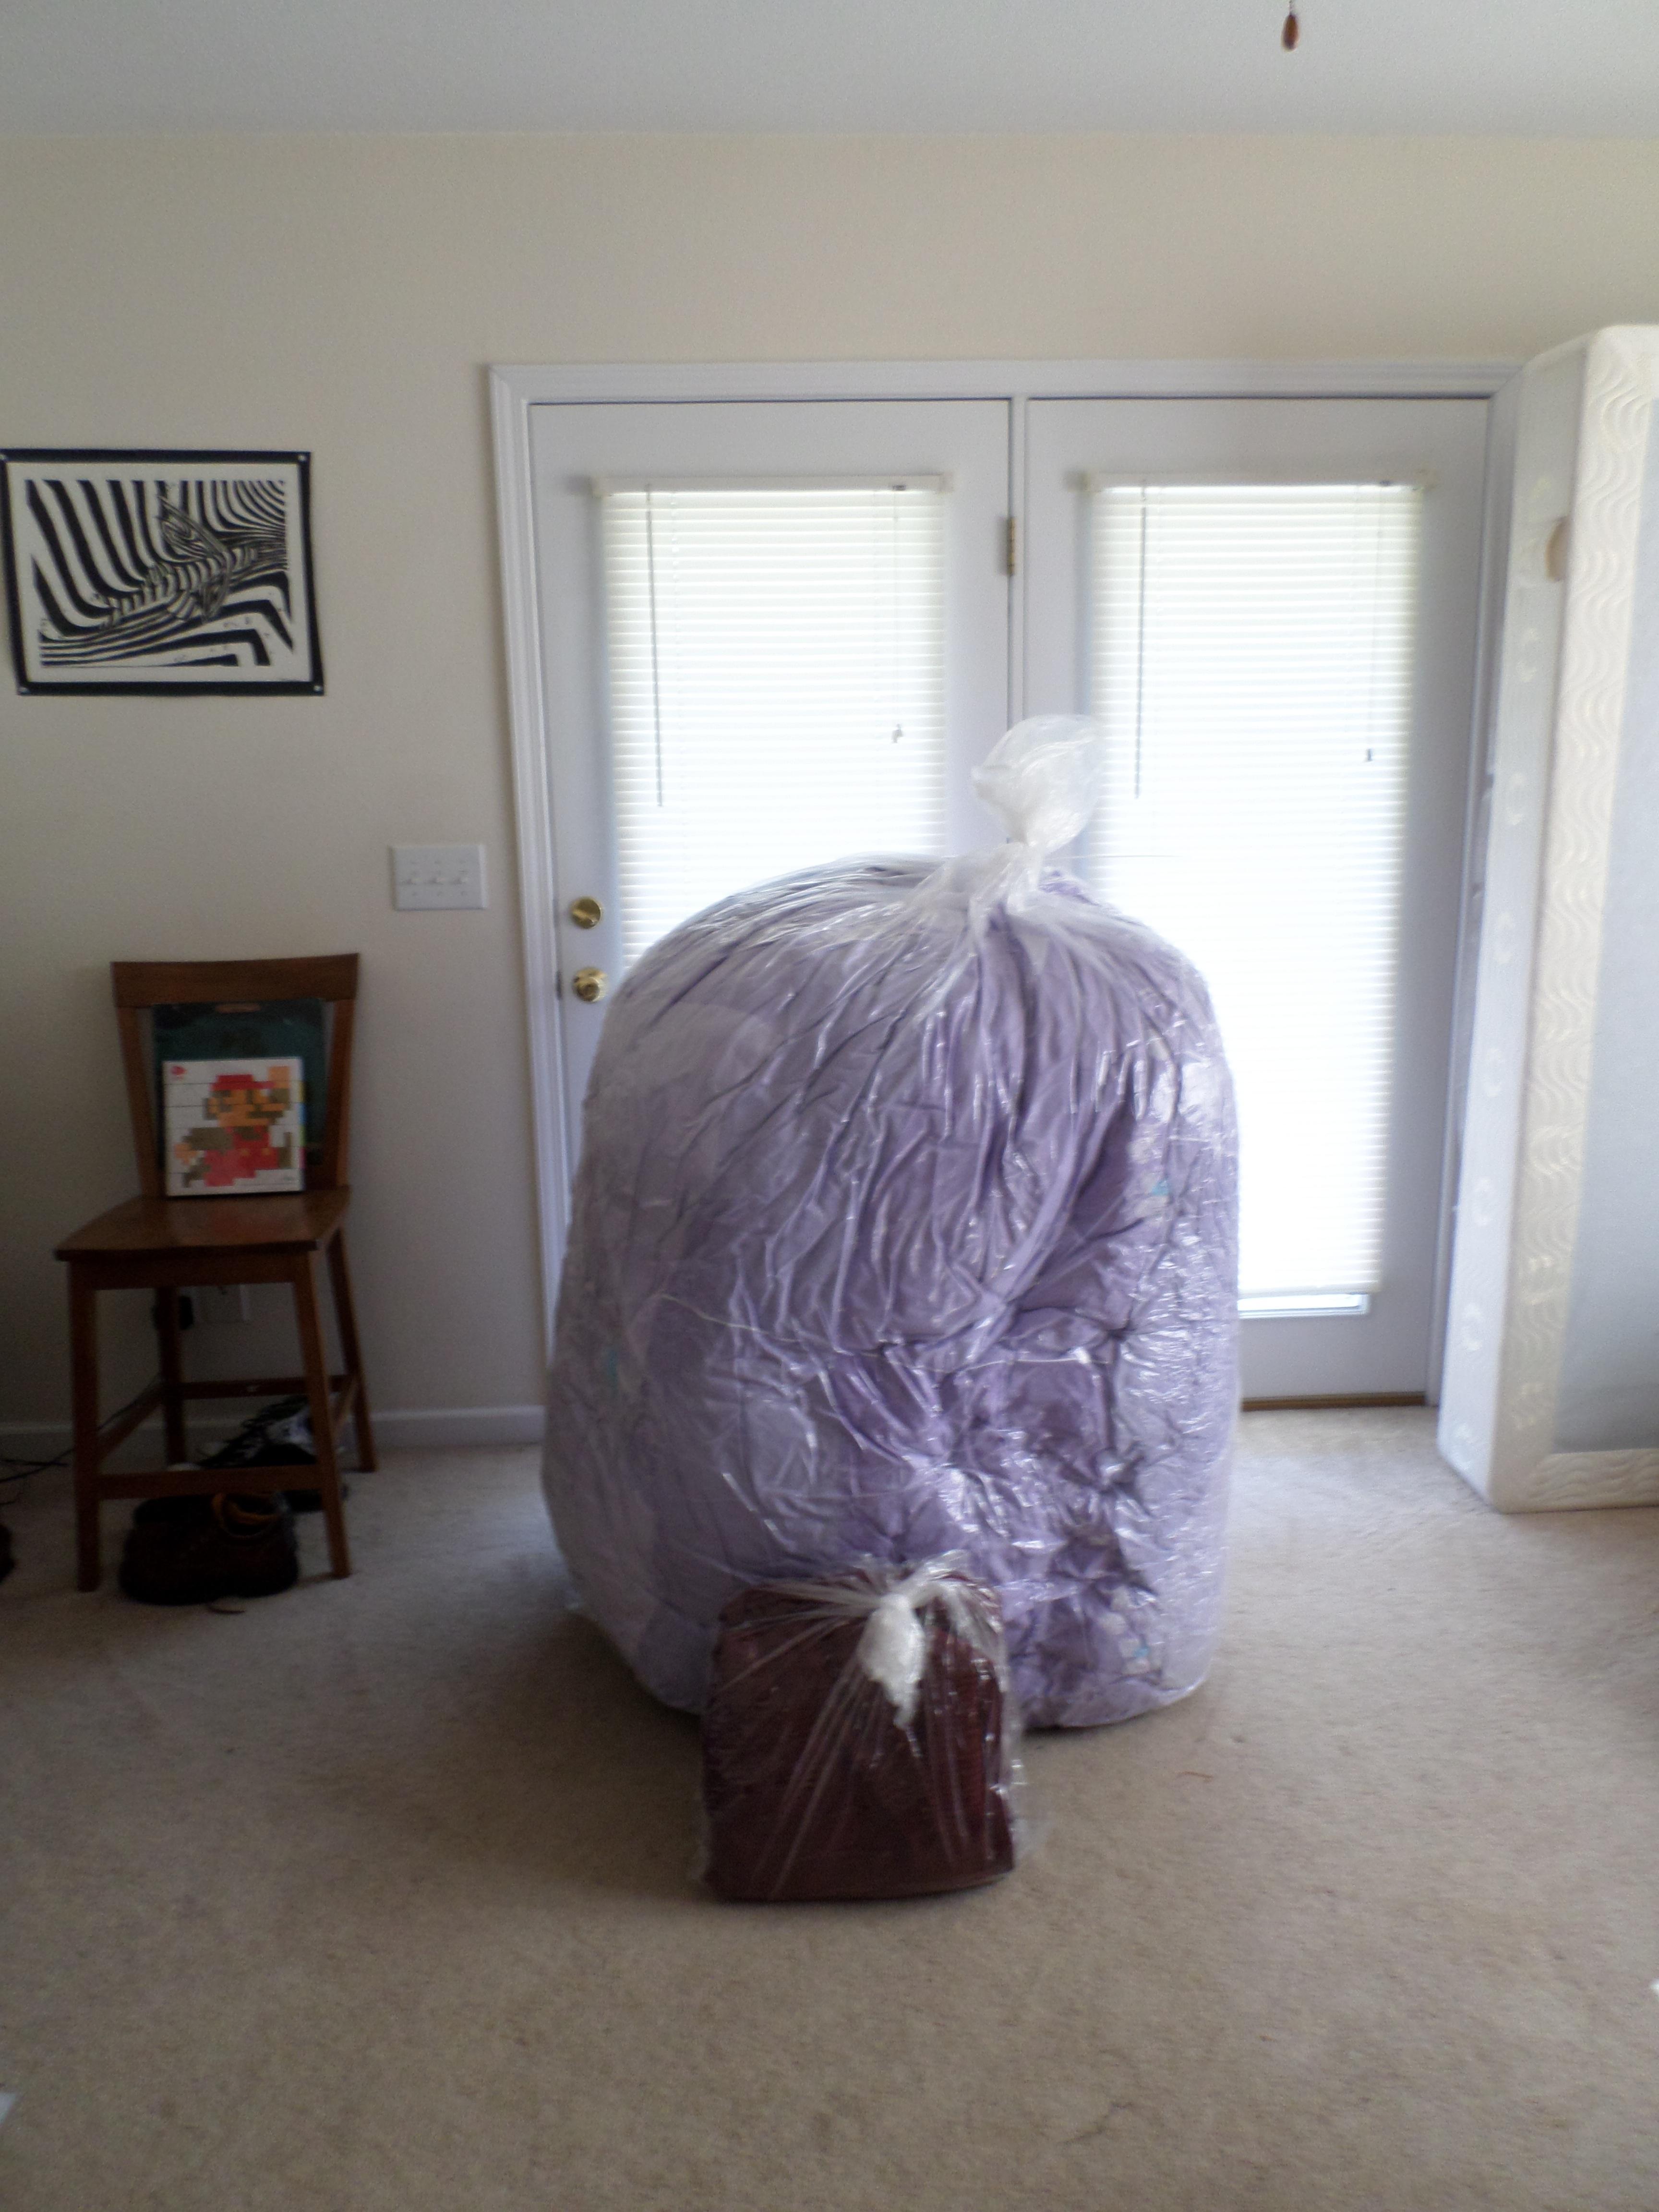 Inside the plastic cocoon, the Gigantor sleeps.